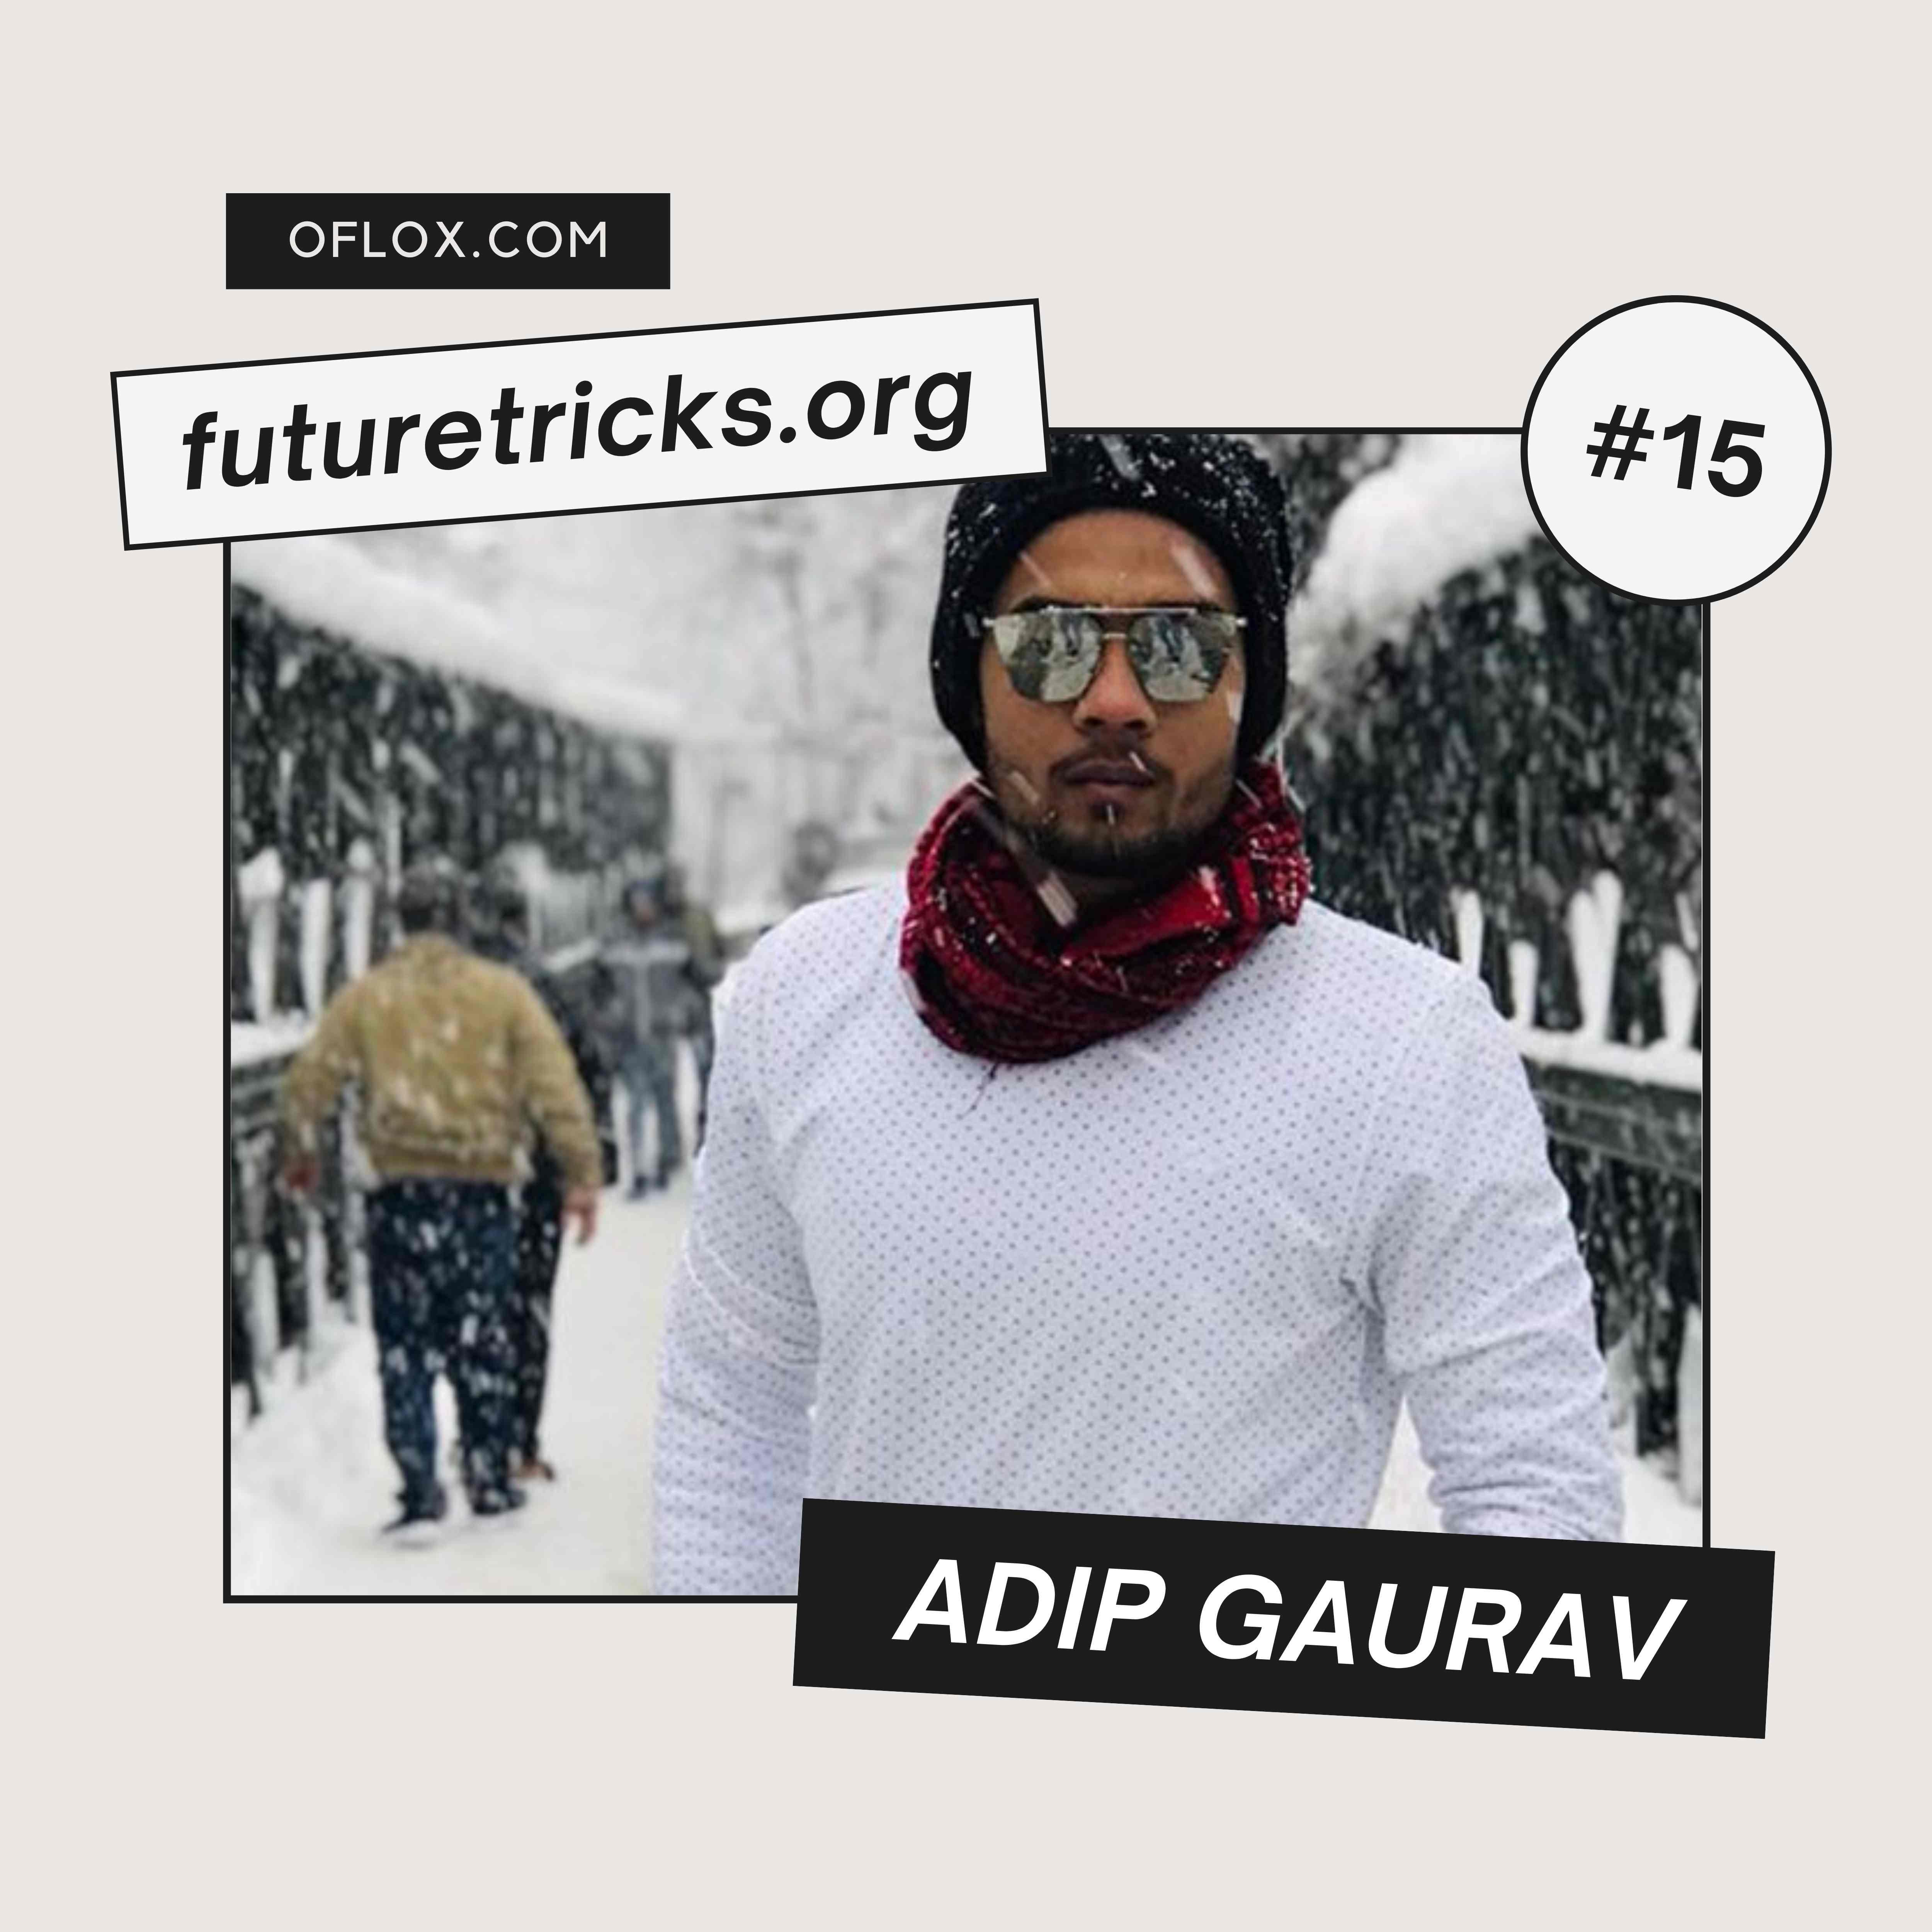 futuretricks.org